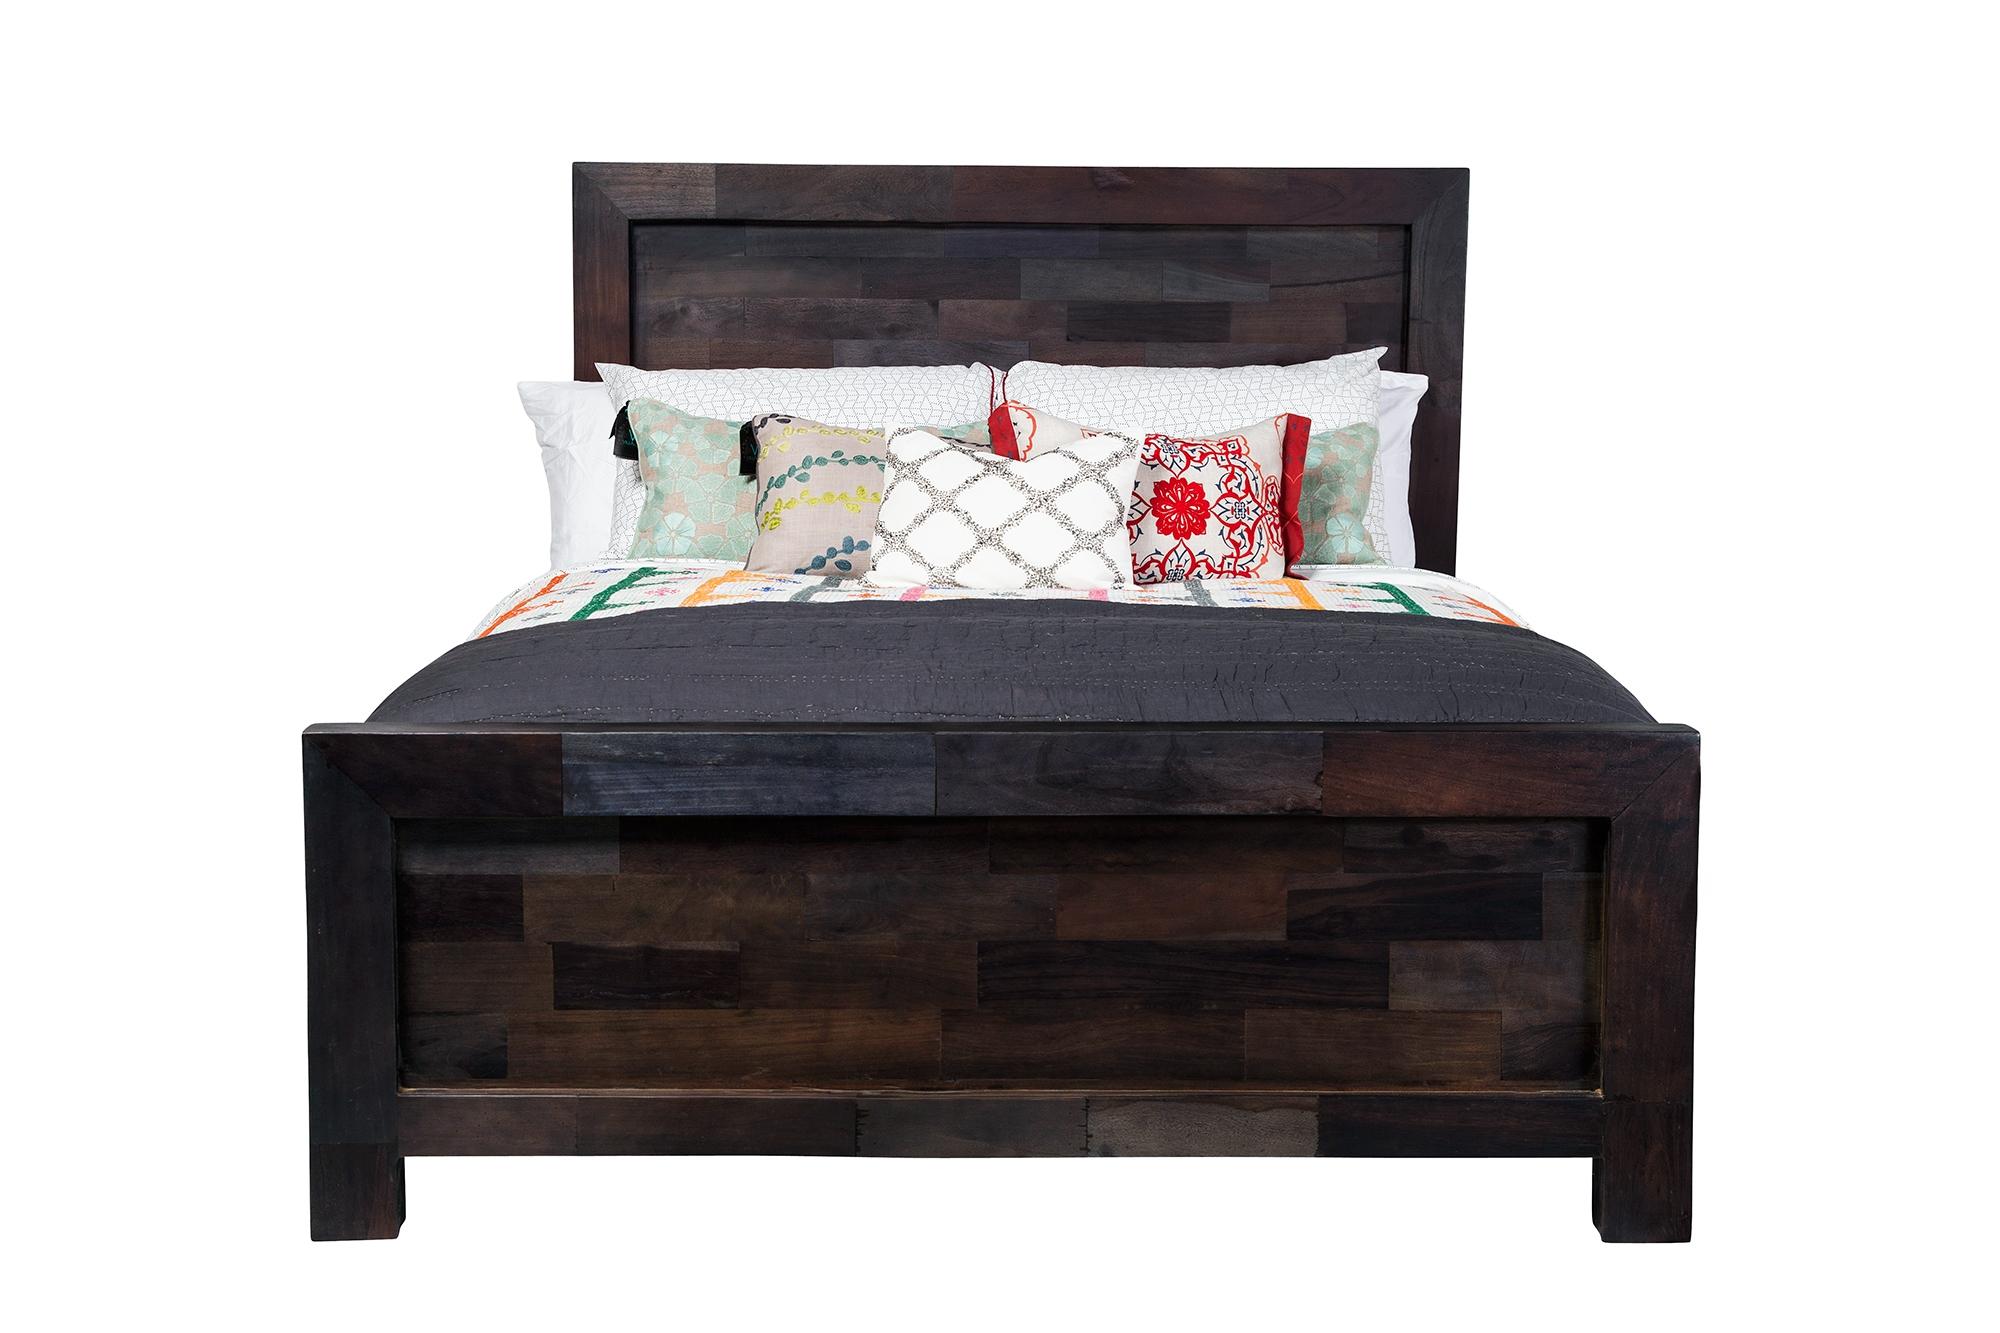 Fullsize Of Queen Bed Frame Wood